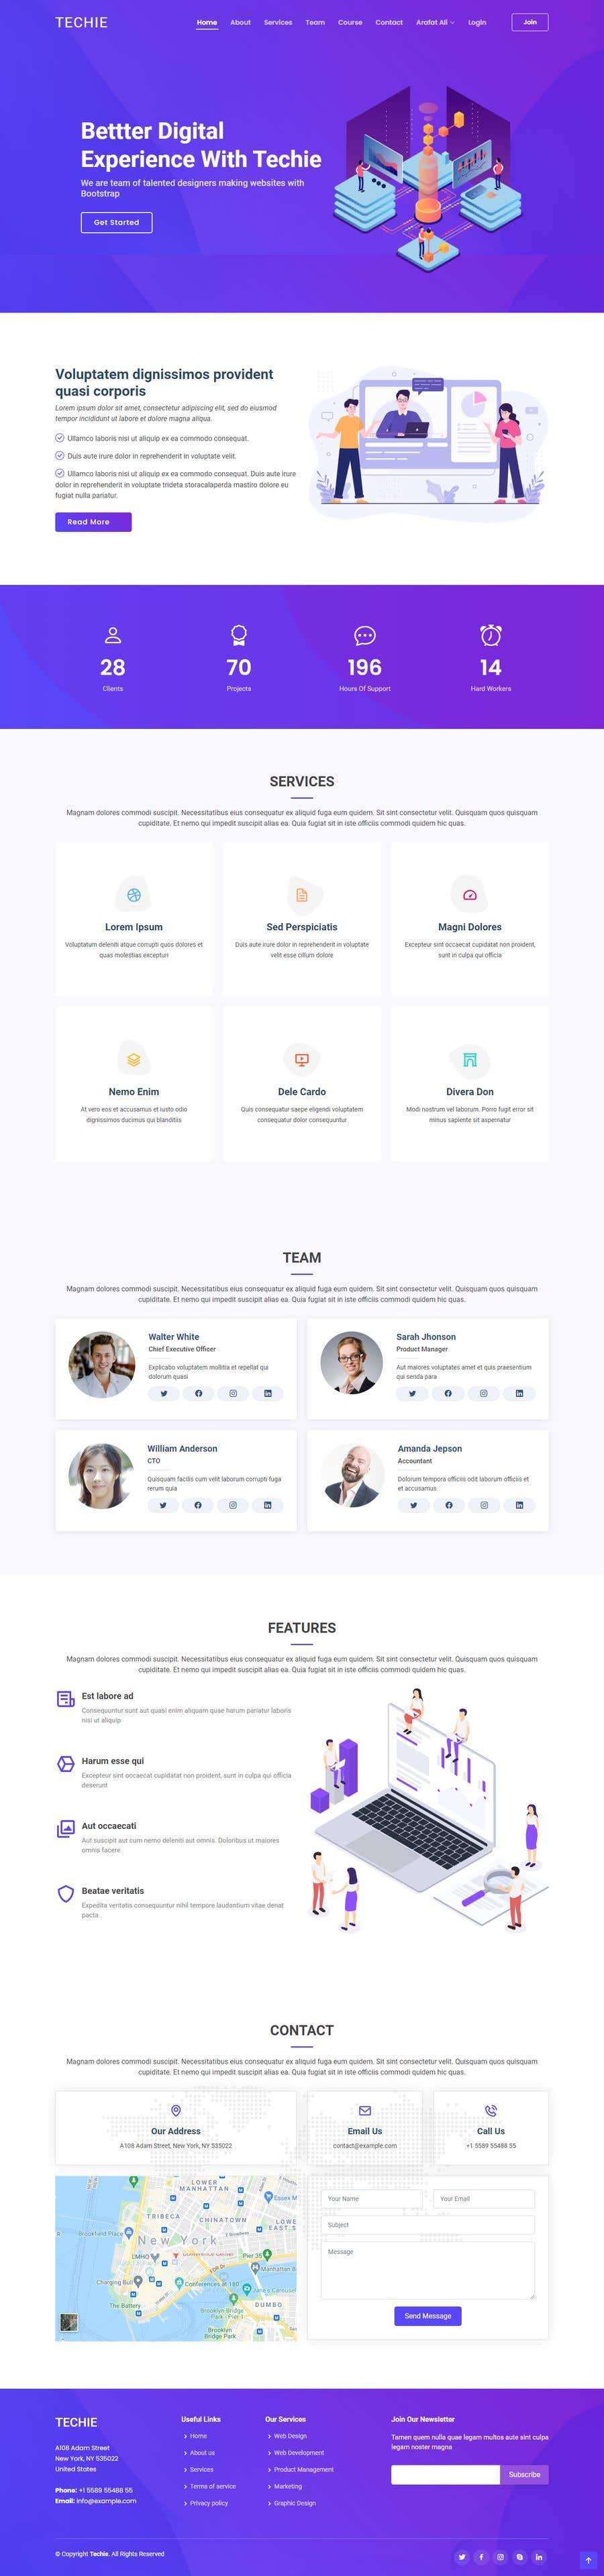 Konkurrenceindlæg #                                        5                                      for                                         Build me a stunning Website/Portal (Looking for UI experts)